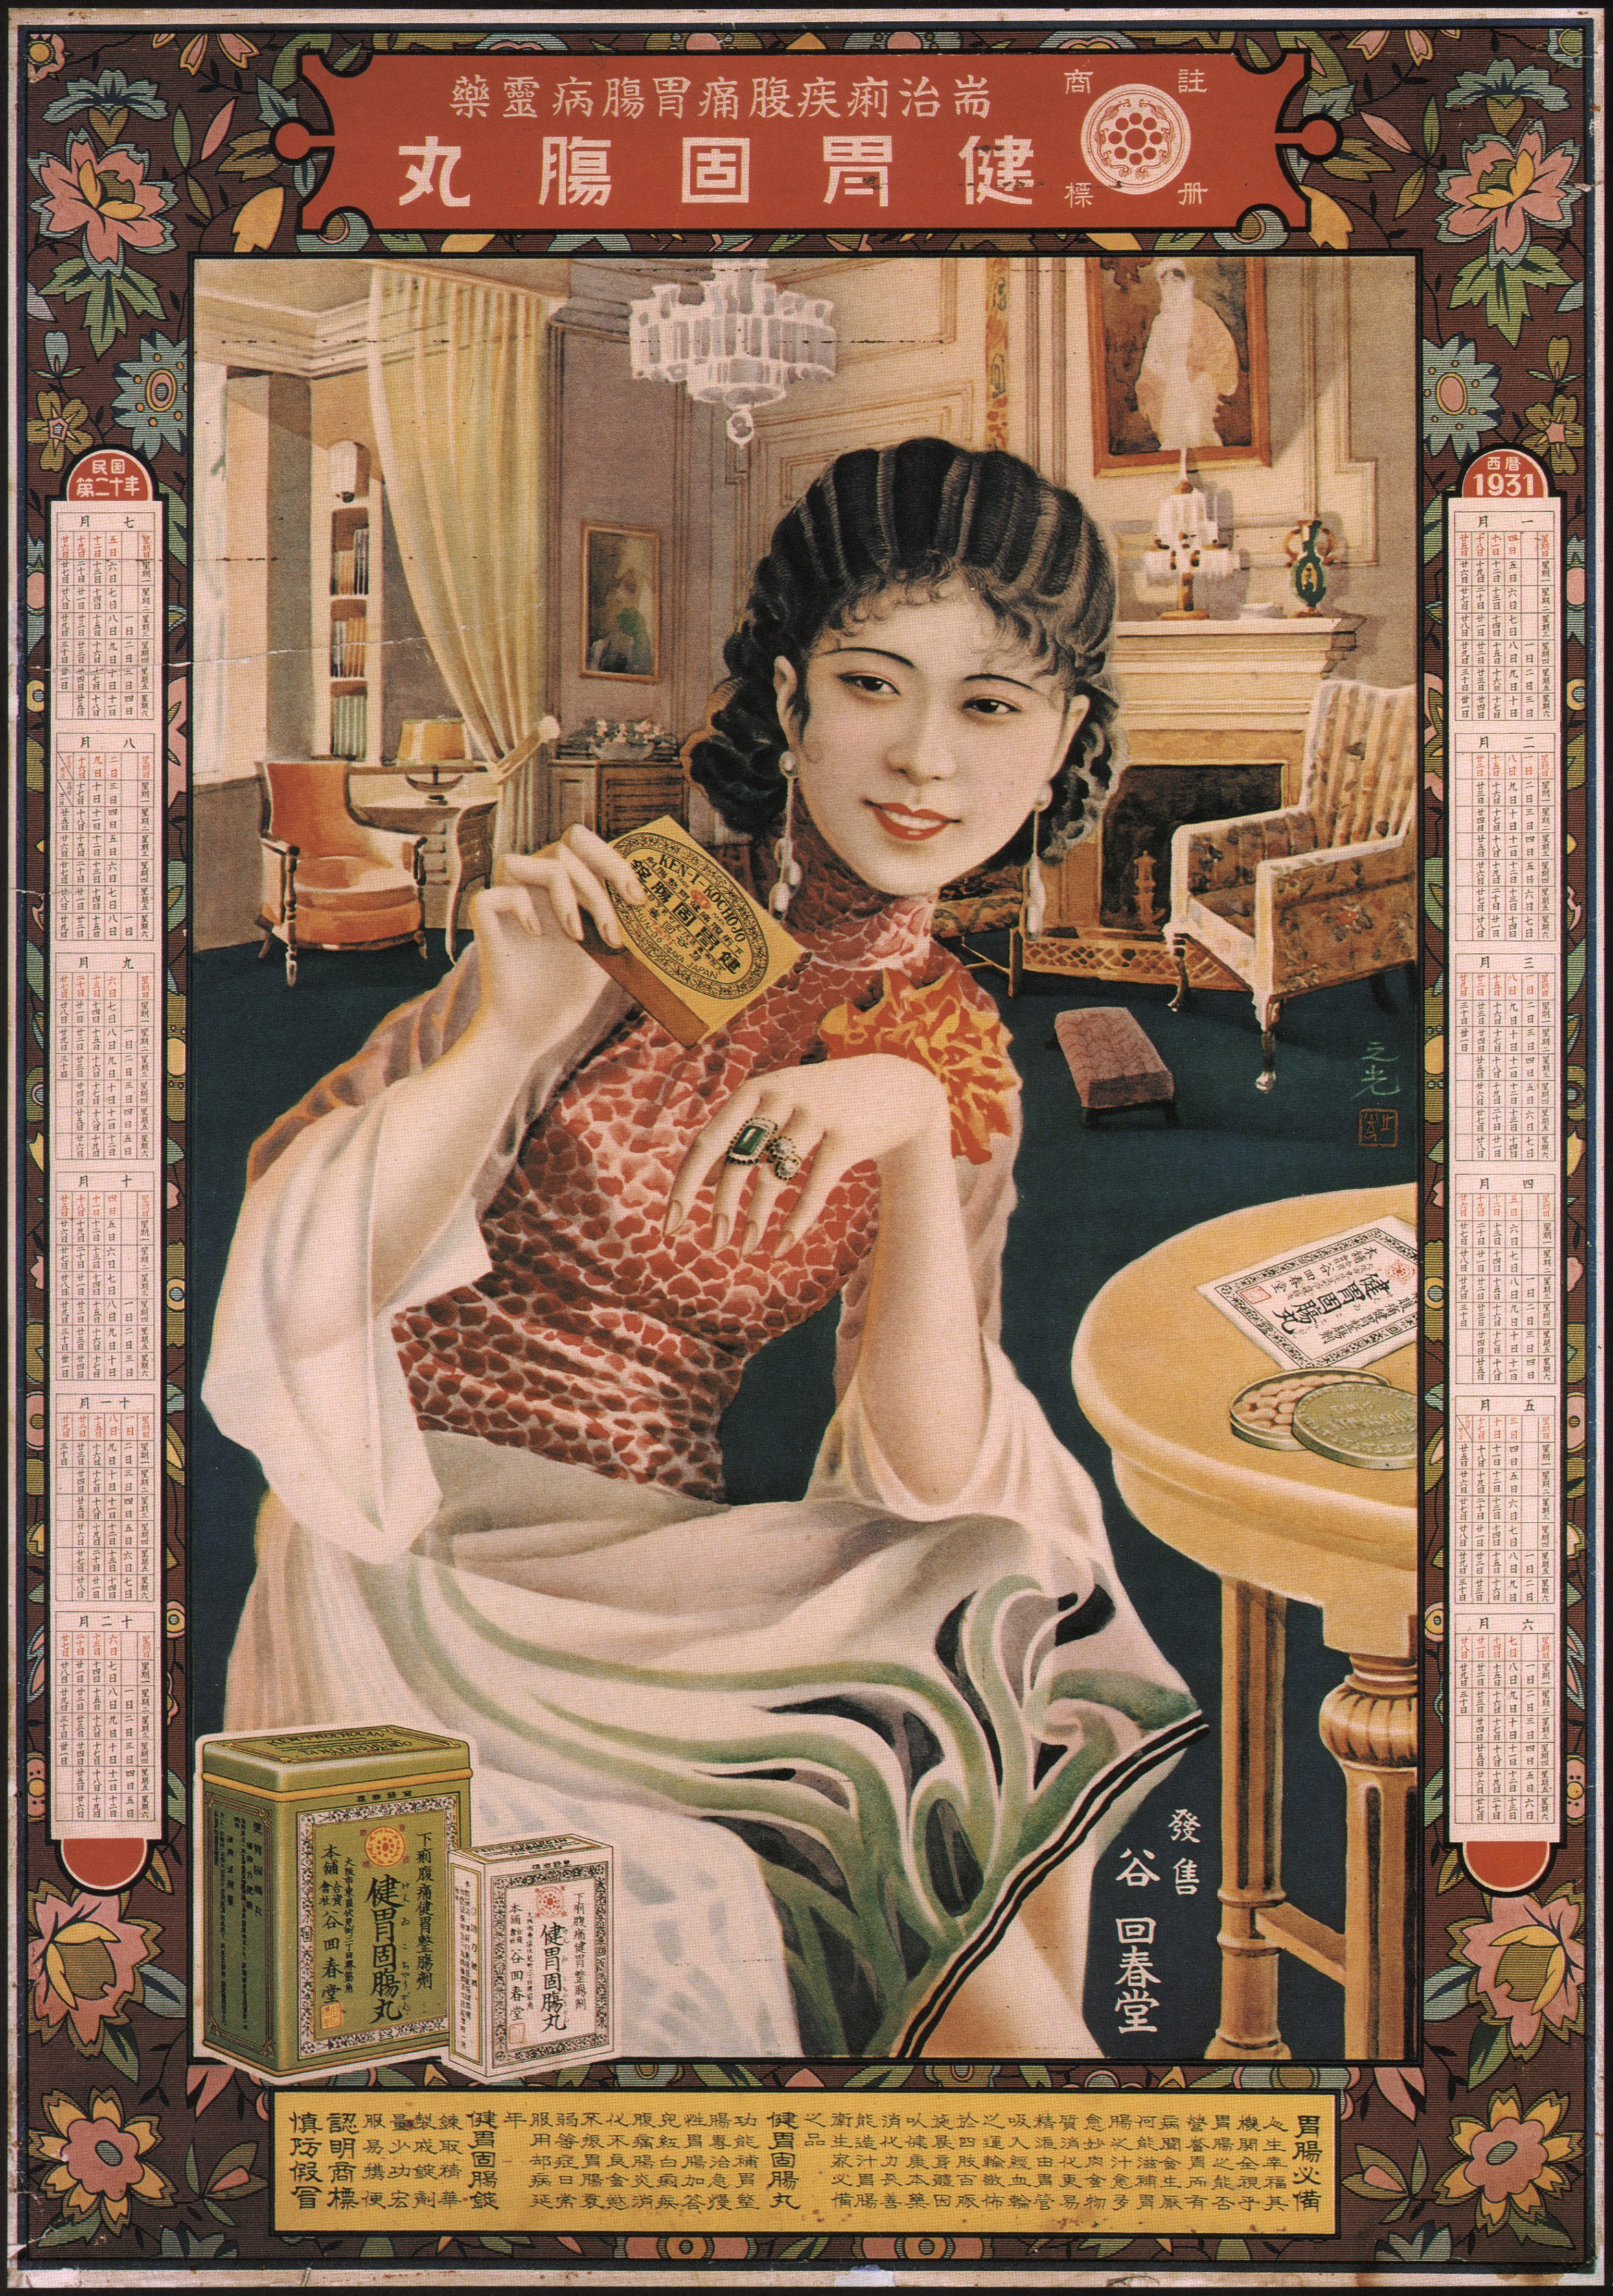 Ken-I-Kohojo-Tablets-1931